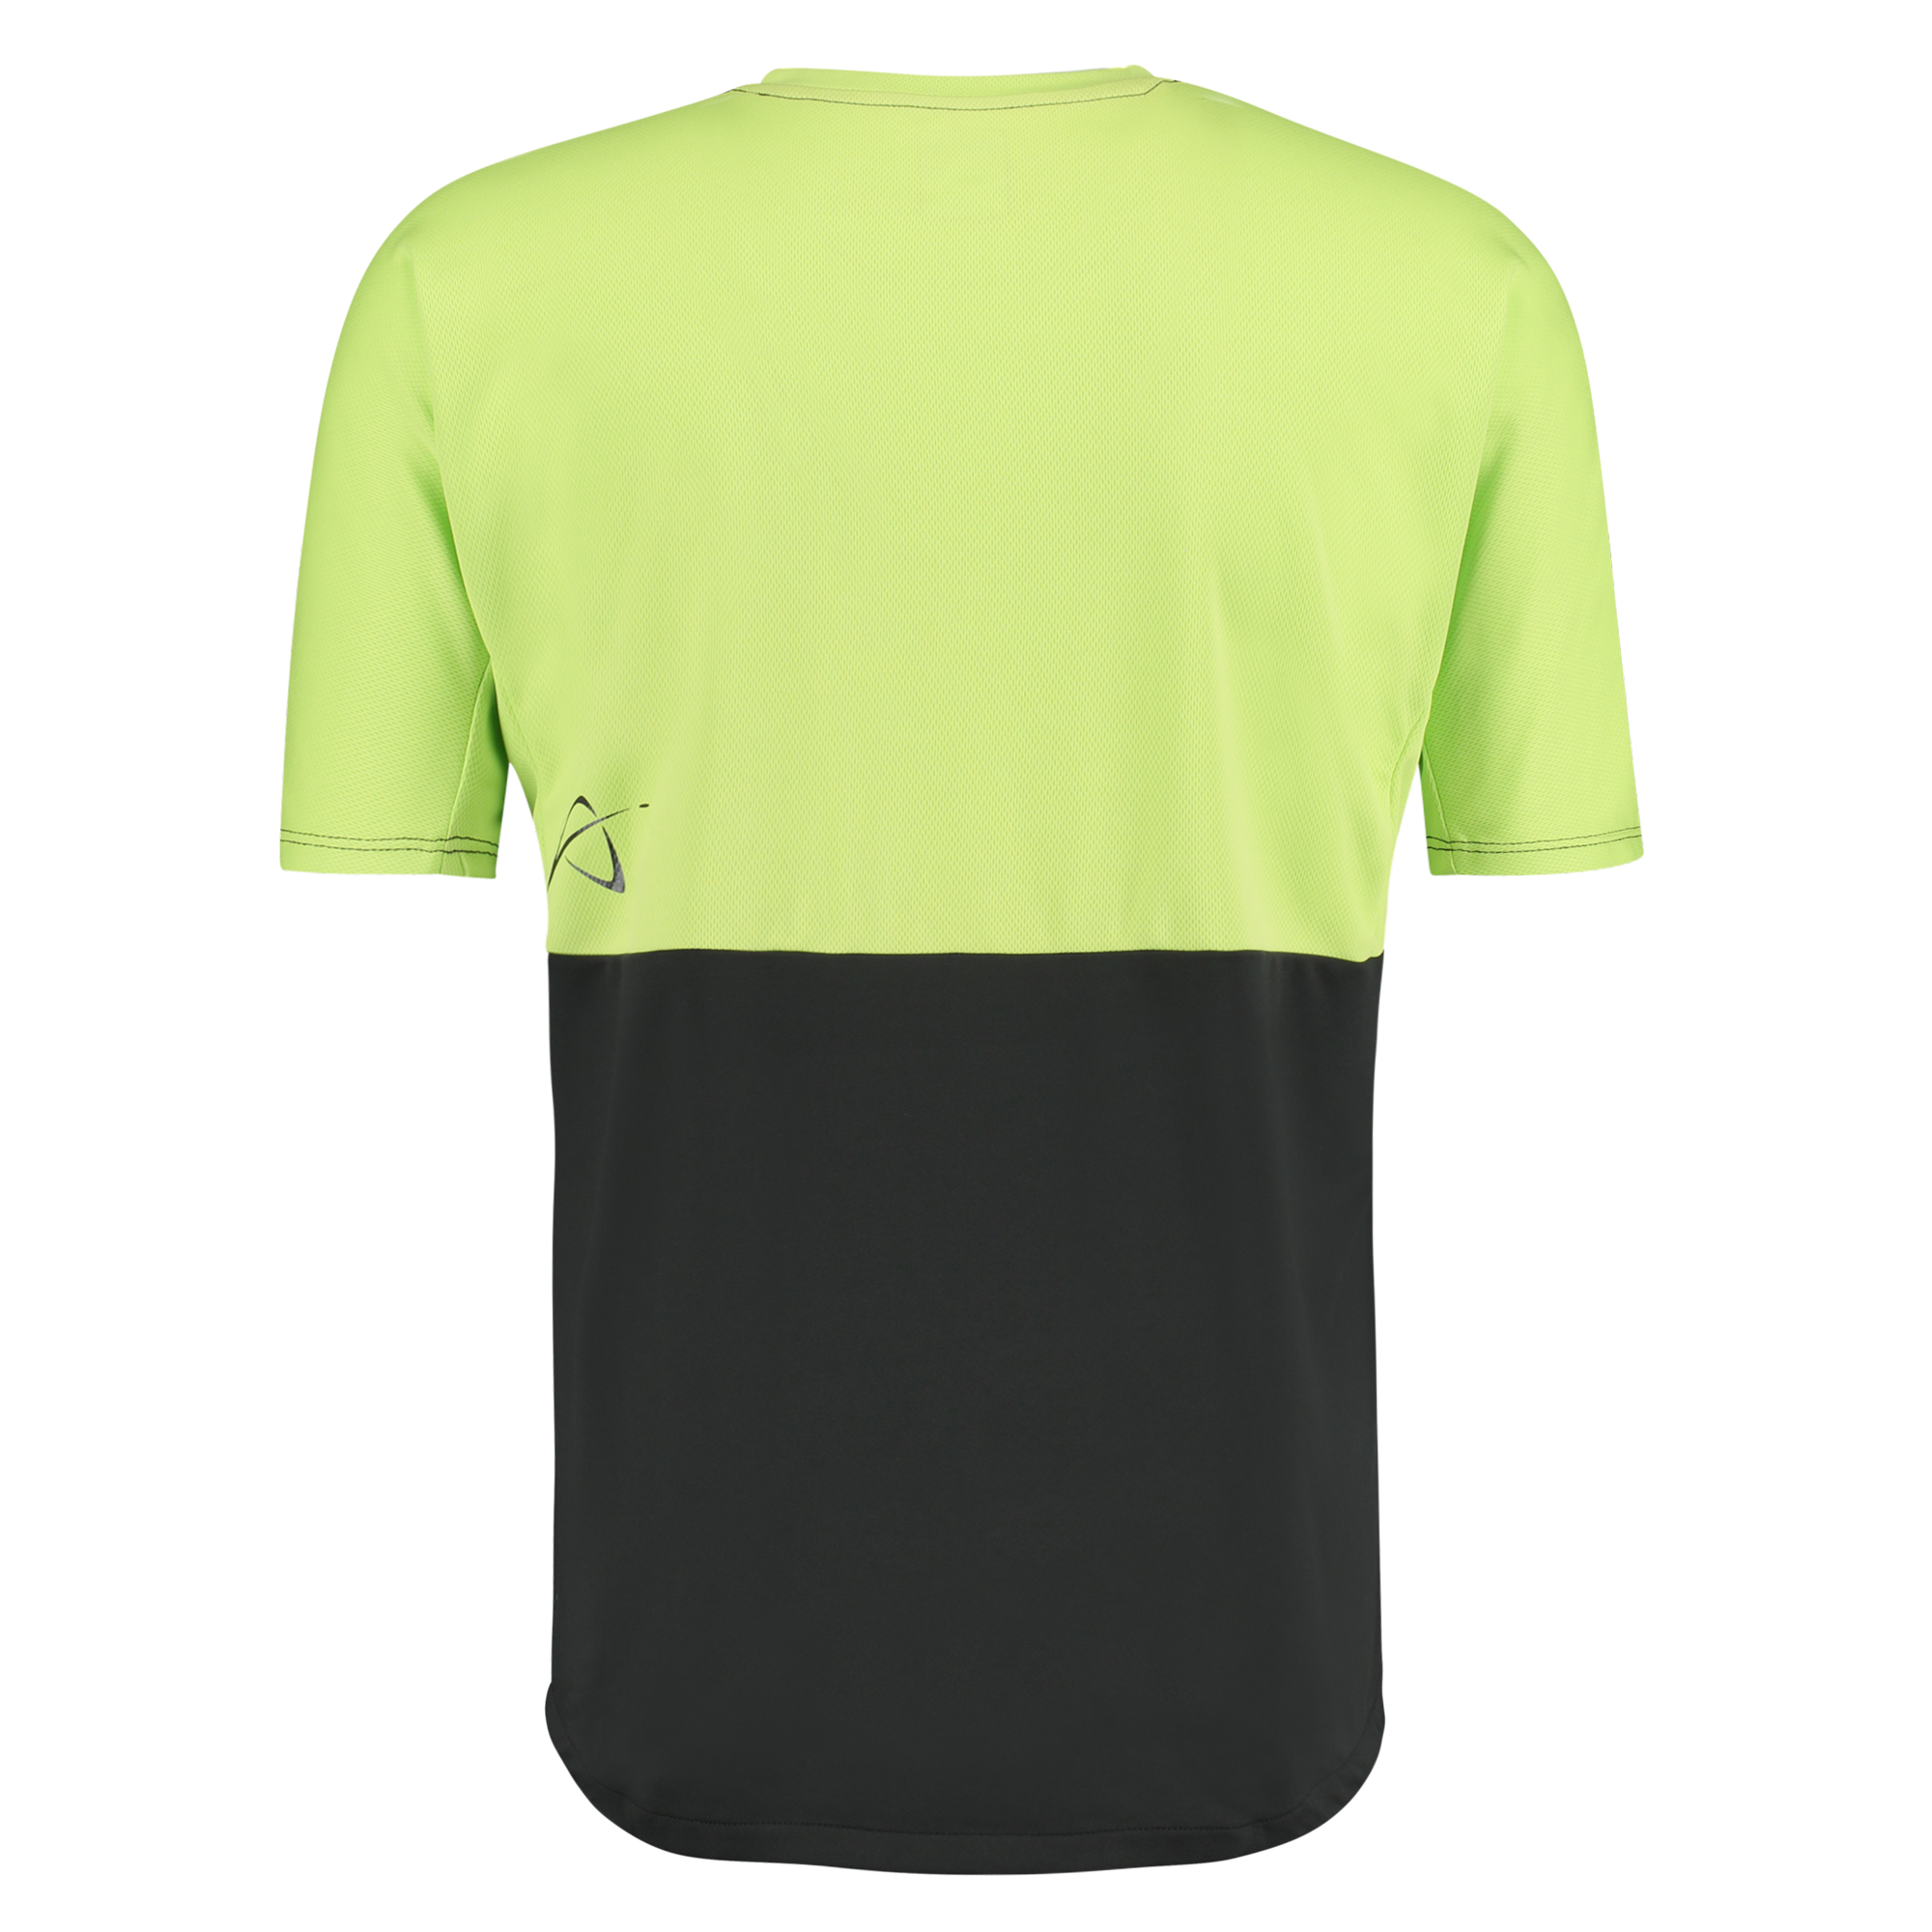 ace top black green back.jpg